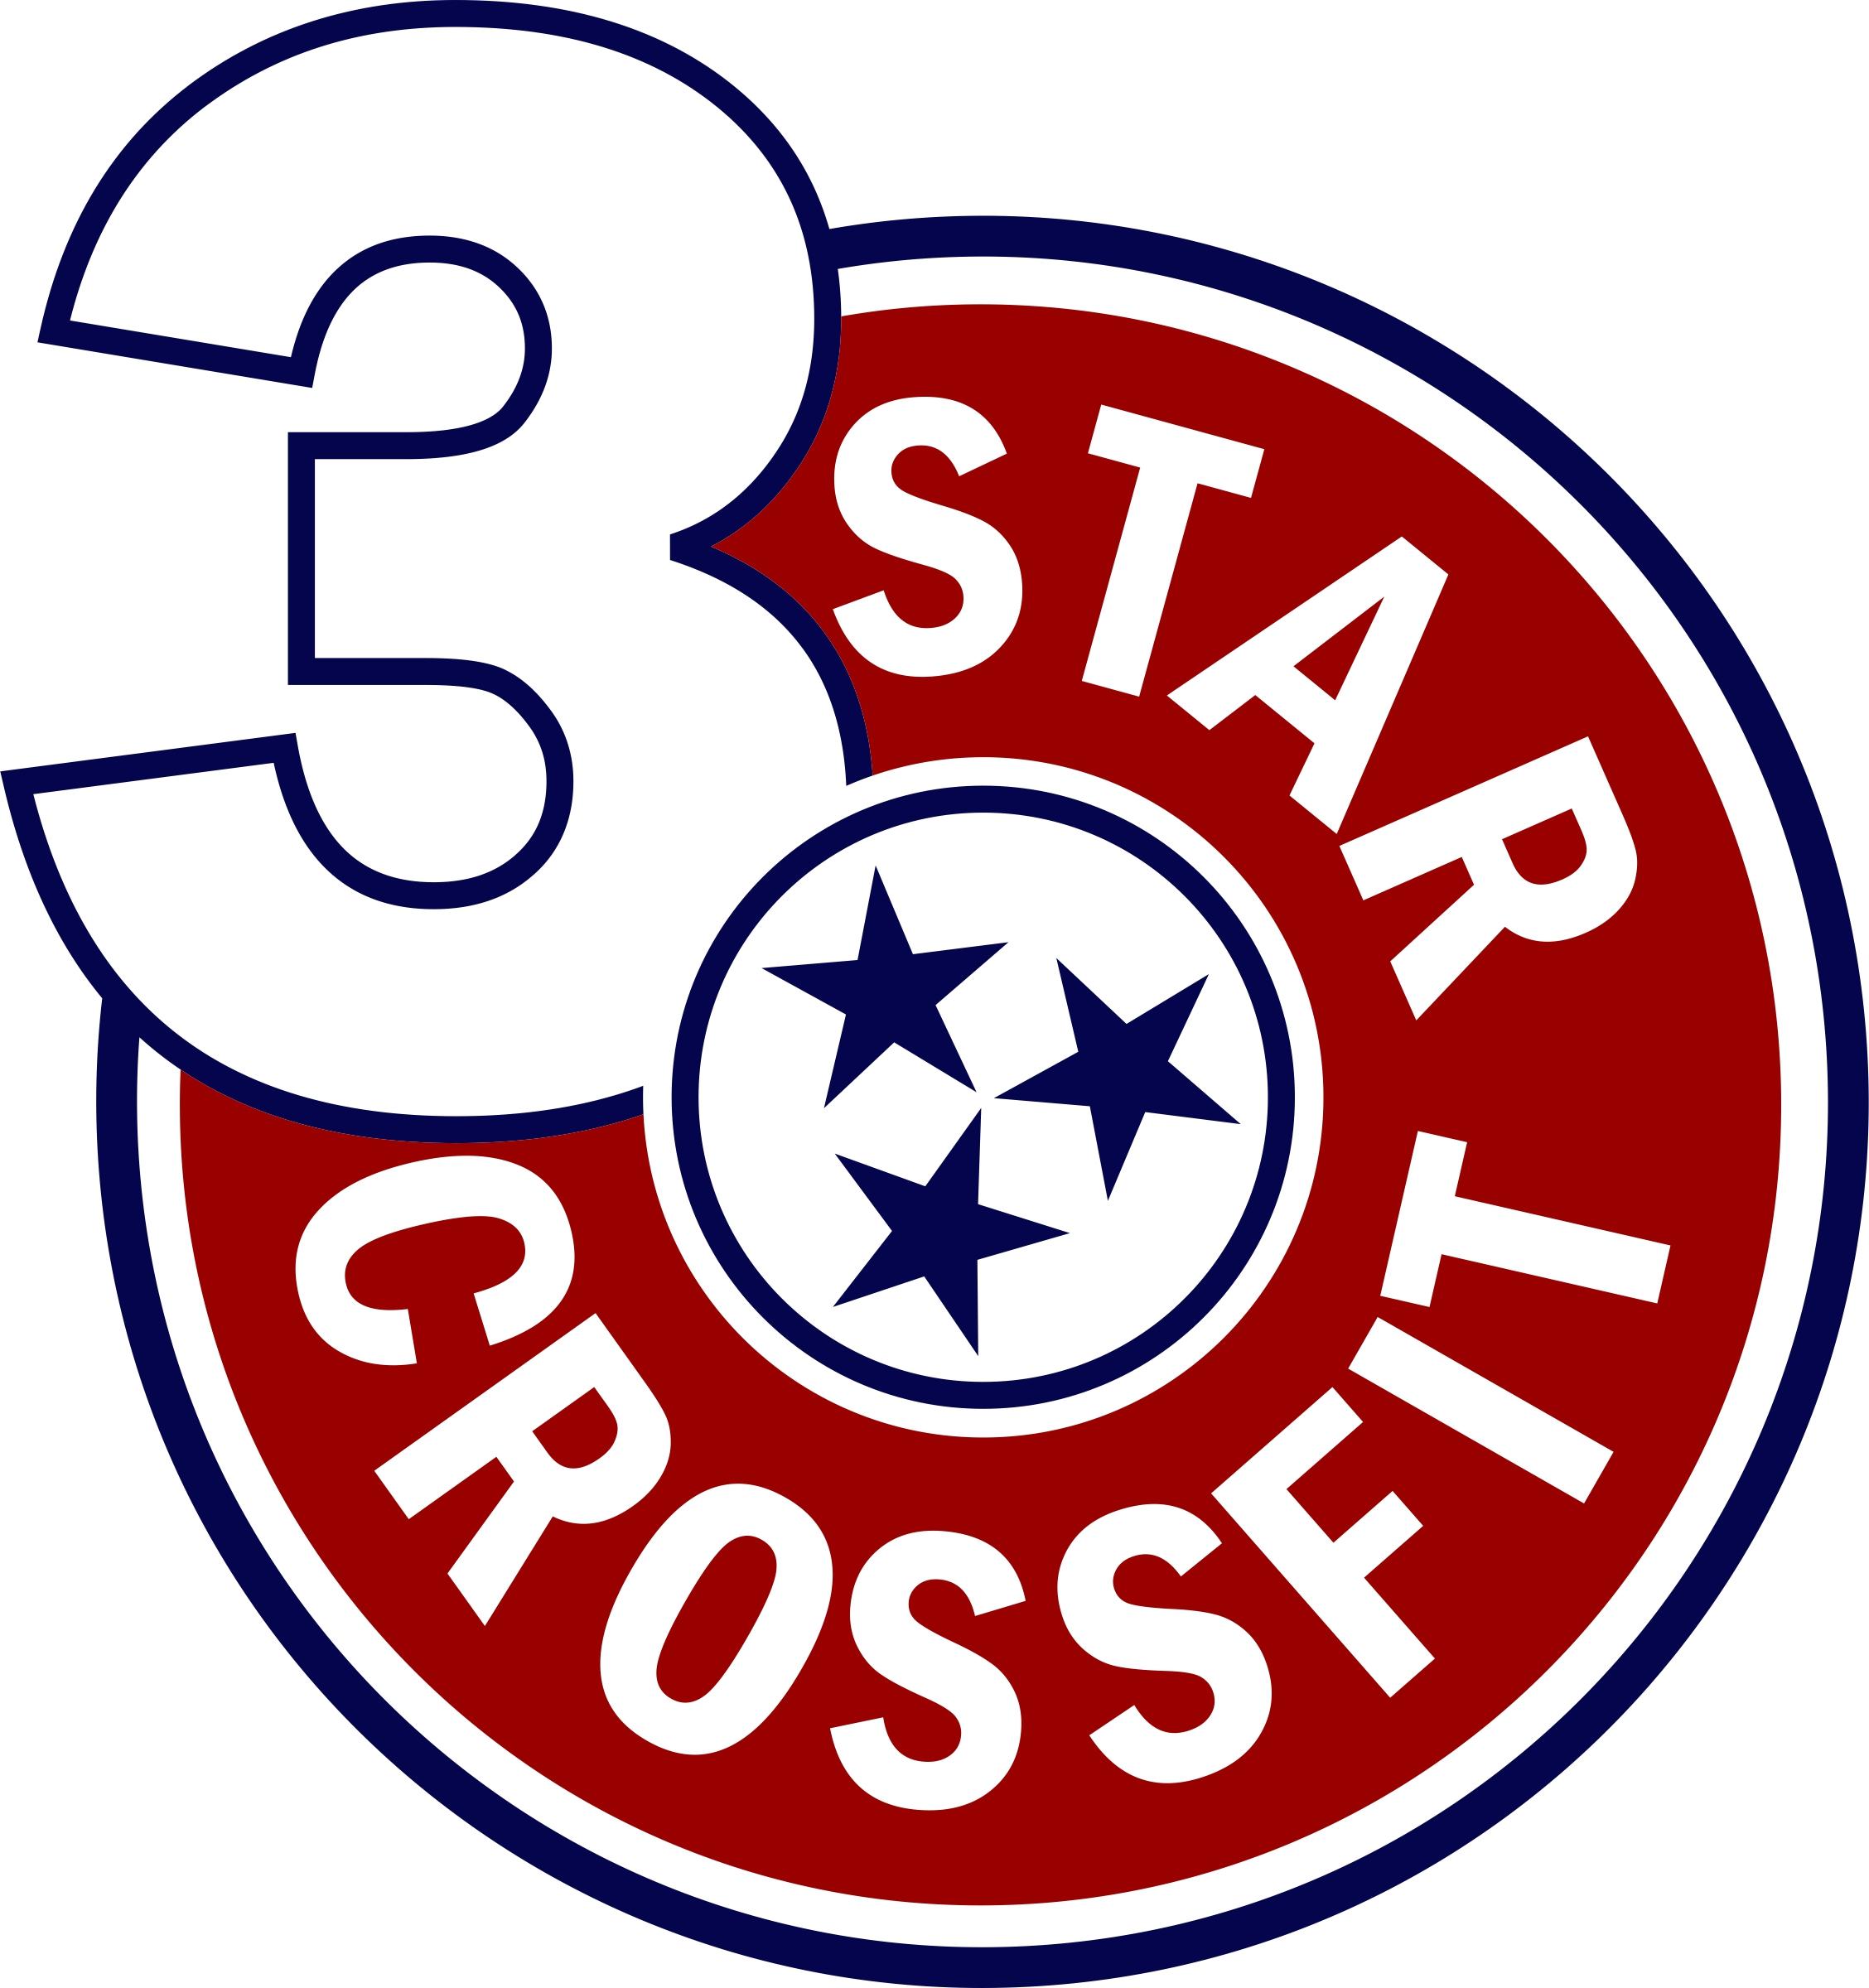 3 Star Crossfit logo